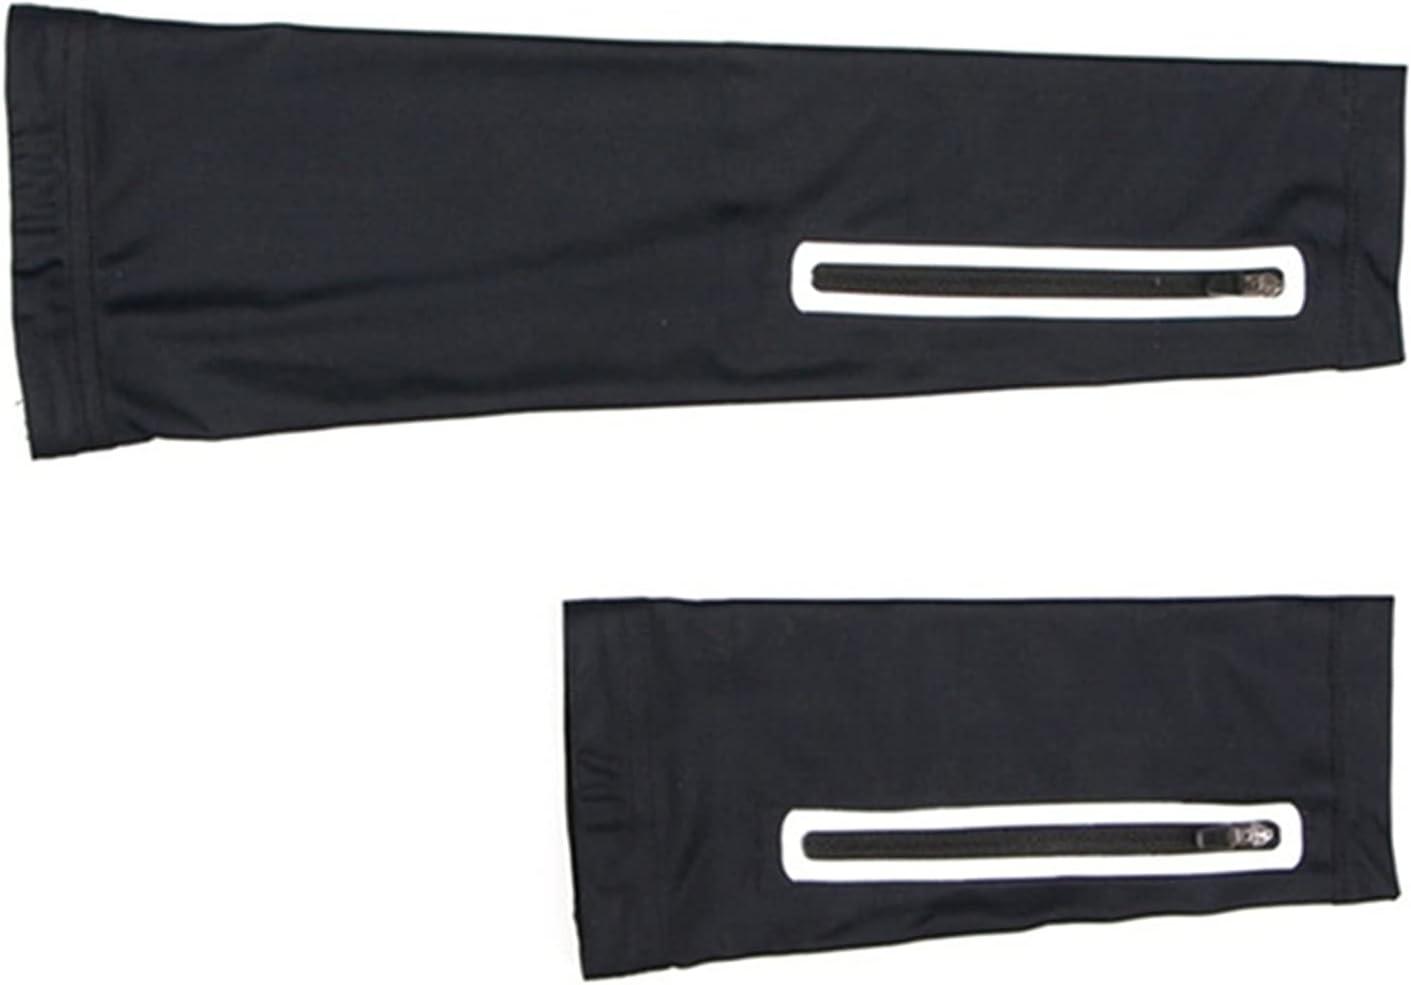 YXXJJ Sports Bag Cell Phone Outdoor Mail order Super-cheap Universa Running Armband